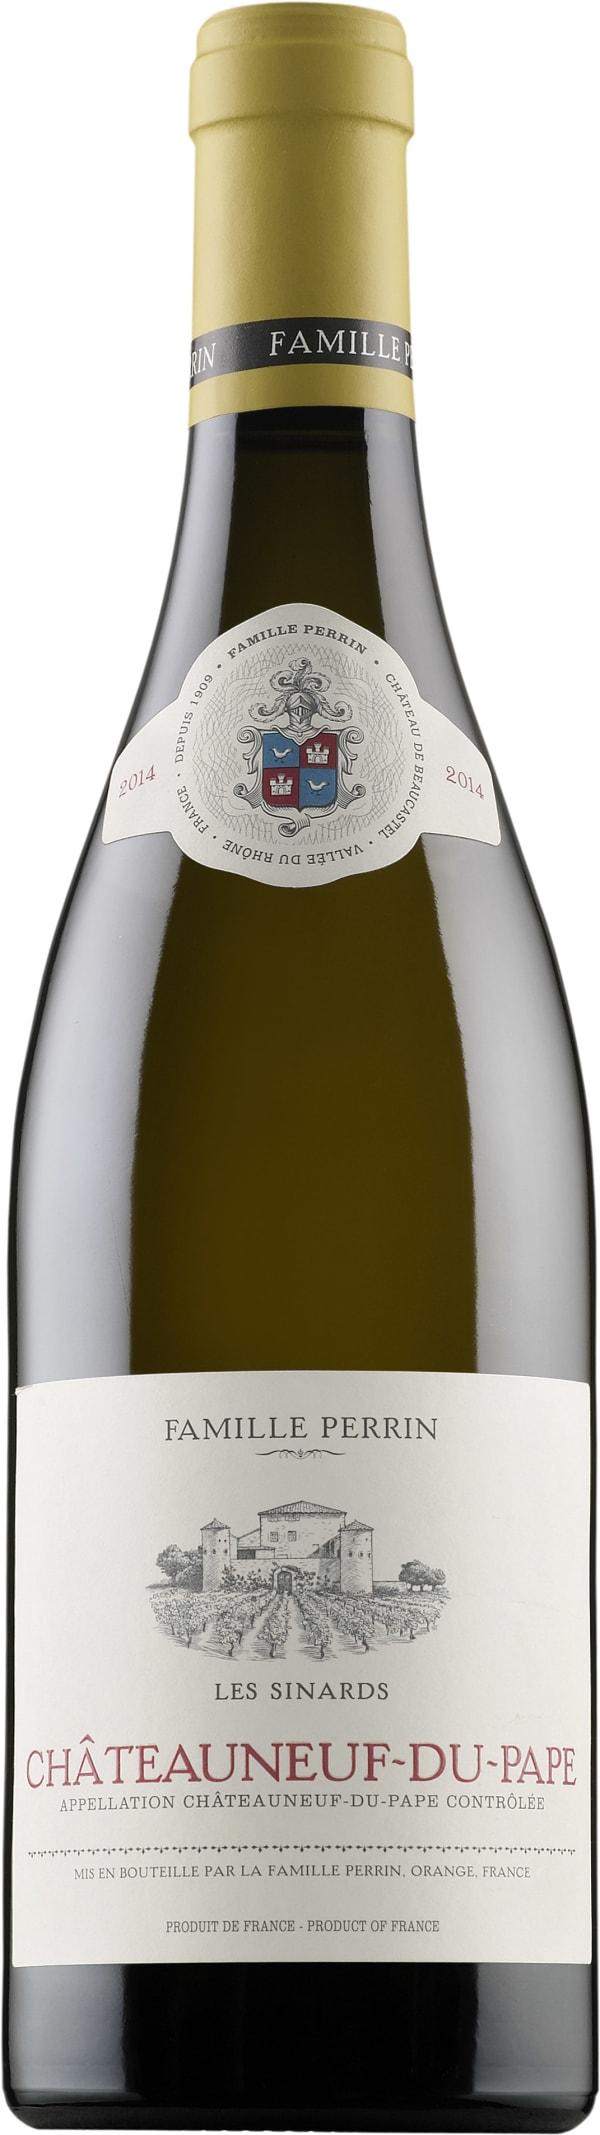 Perrin Châteauneuf-du-Pape Les Sinards 2014